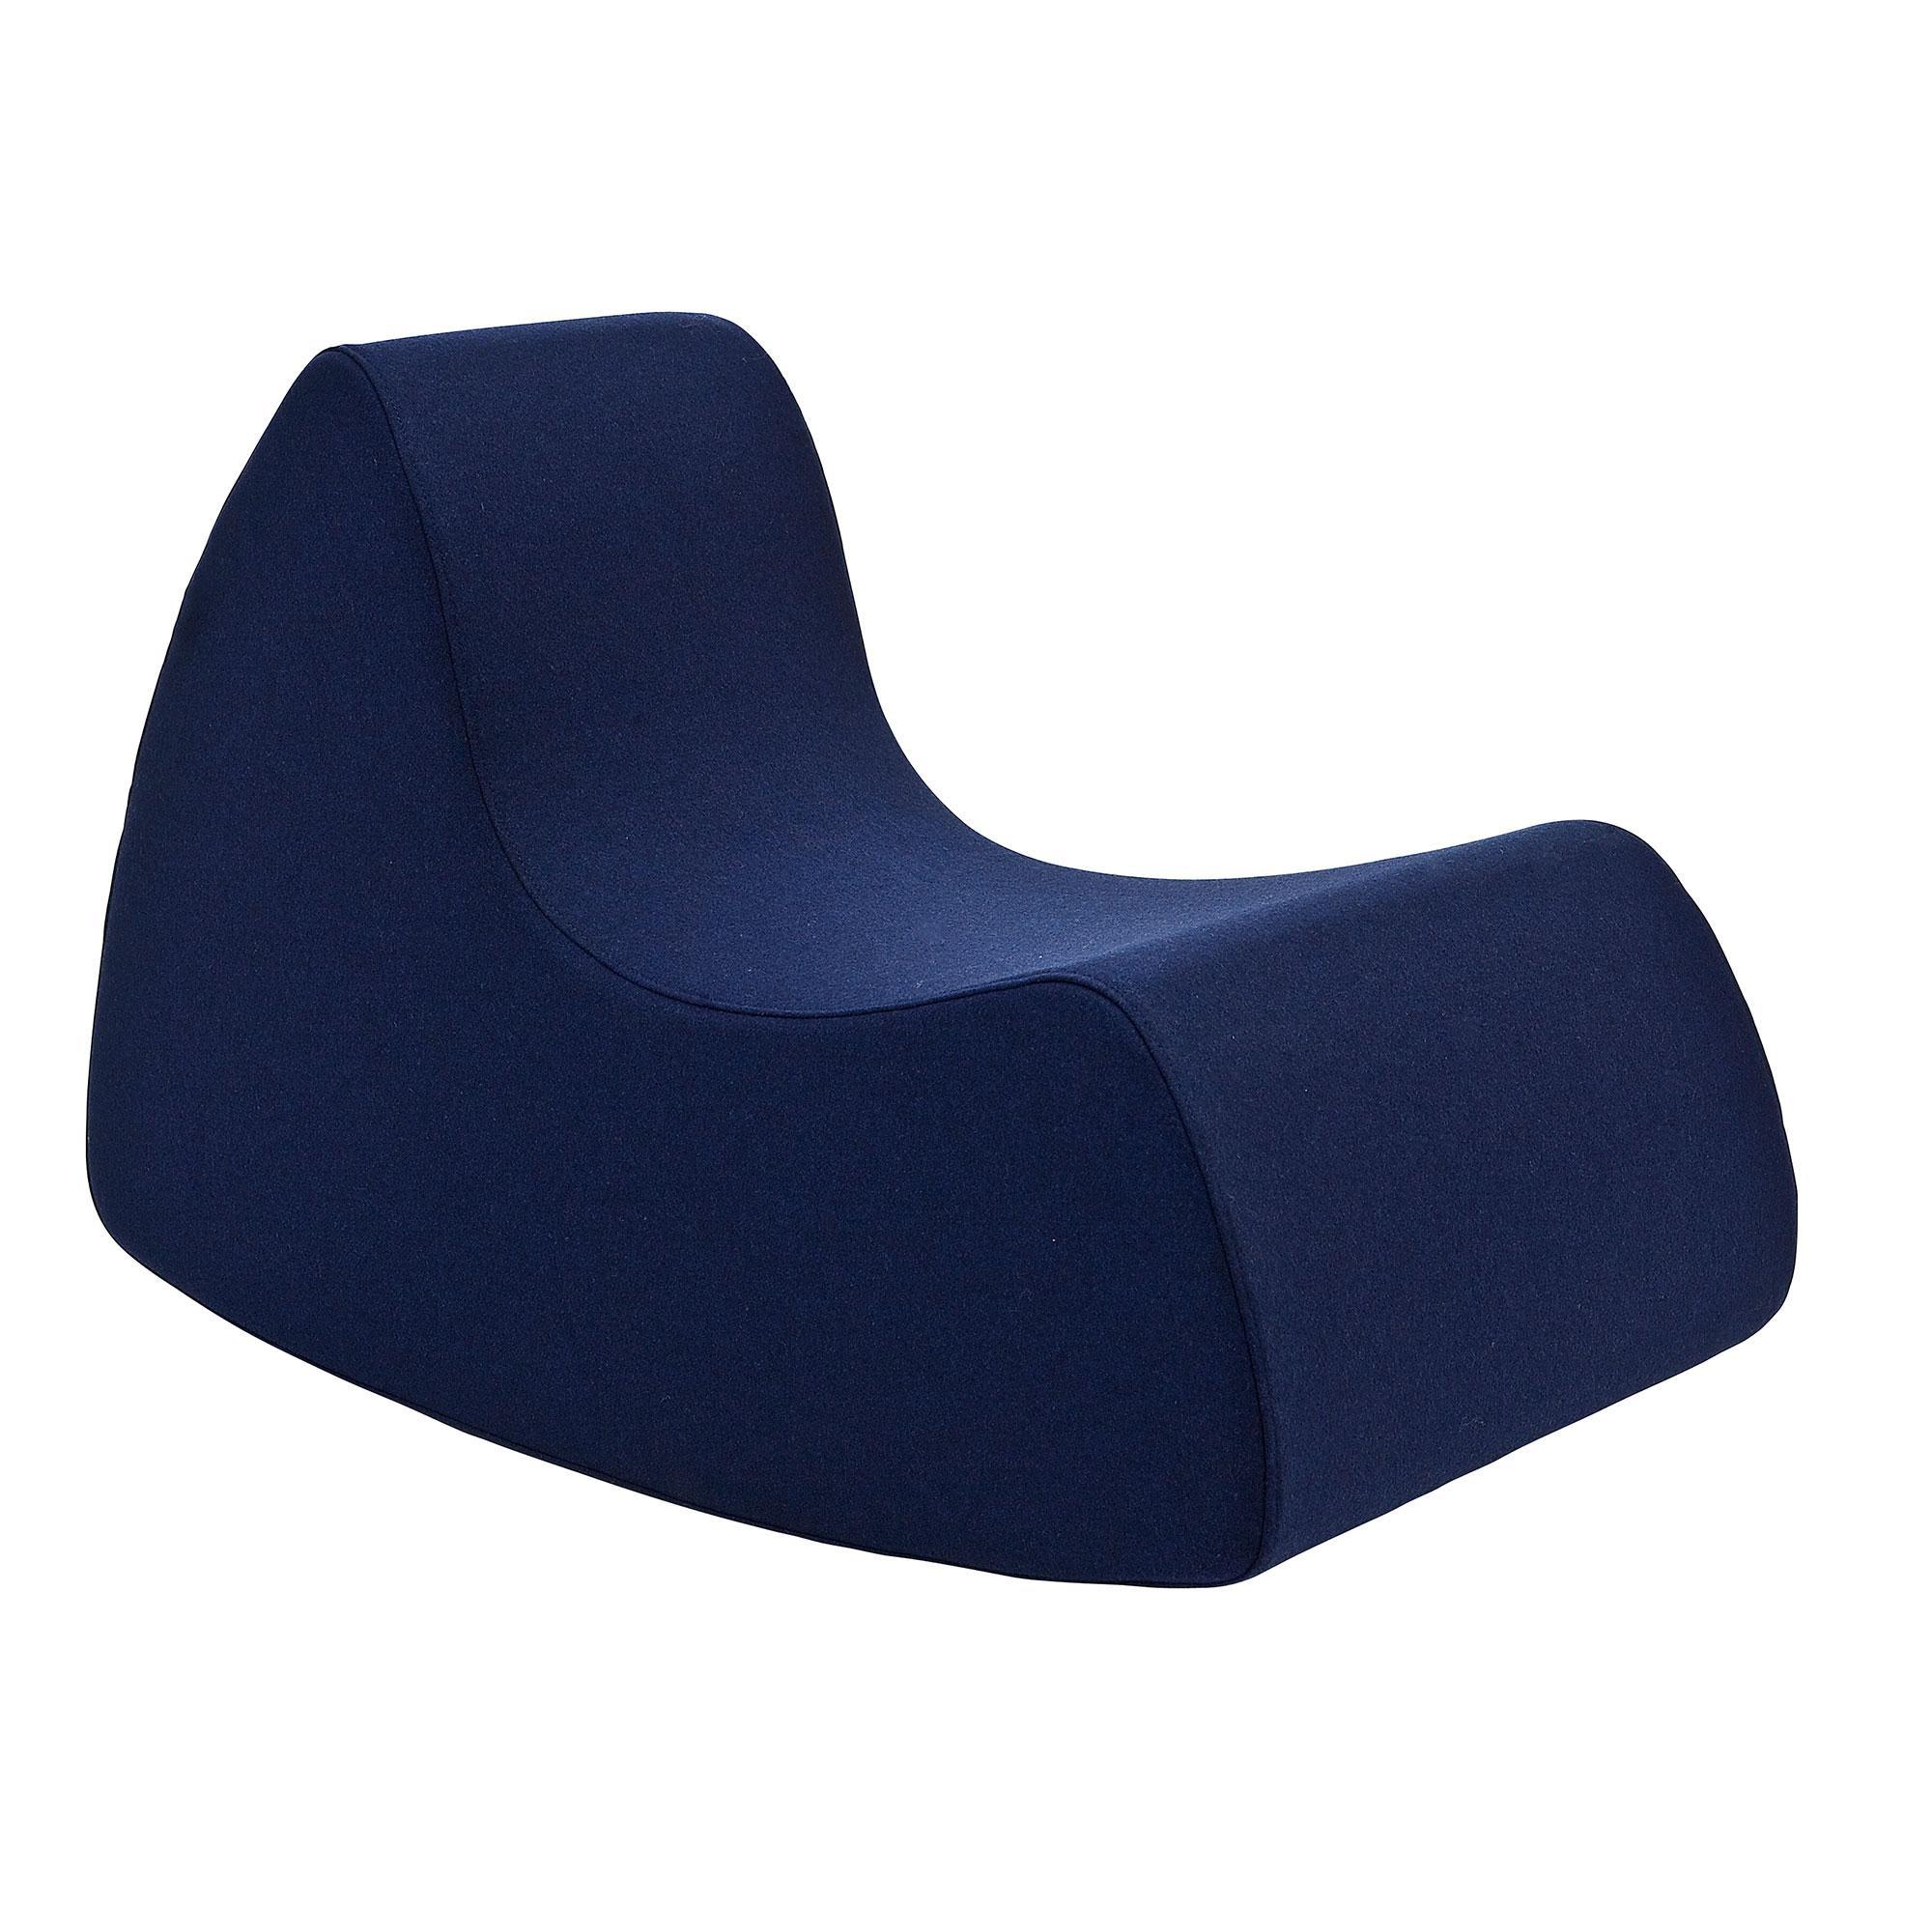 Softline - Grand Prix Kindersessel - dunkelblau/Stoff Filz 859/50x53x80cm | Kinderzimmer > Kindersessel & Kindersofas | Softline